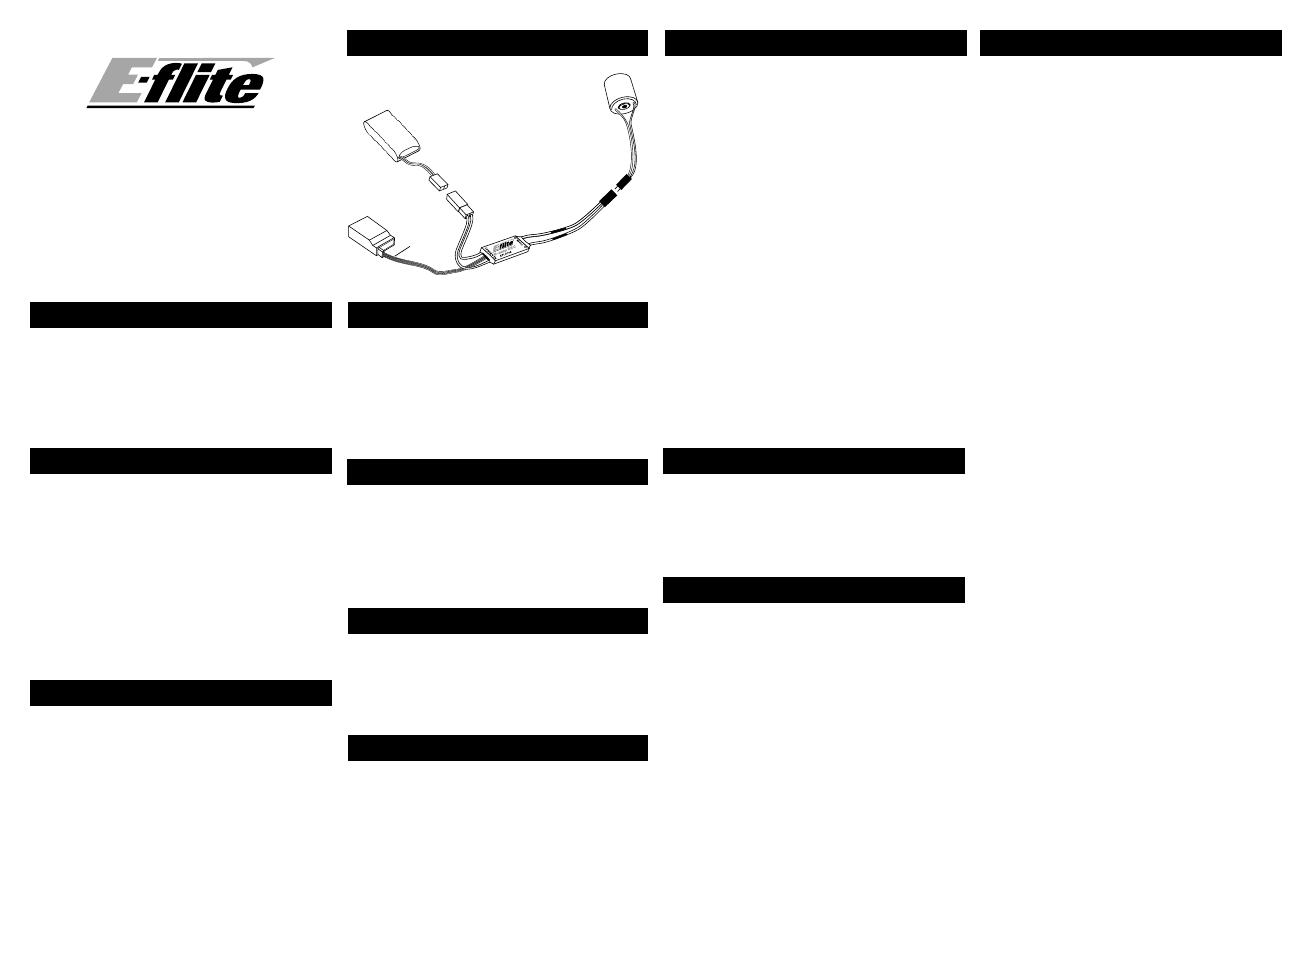 E Flite 10 Amp Micro Brushed Esc User Manual